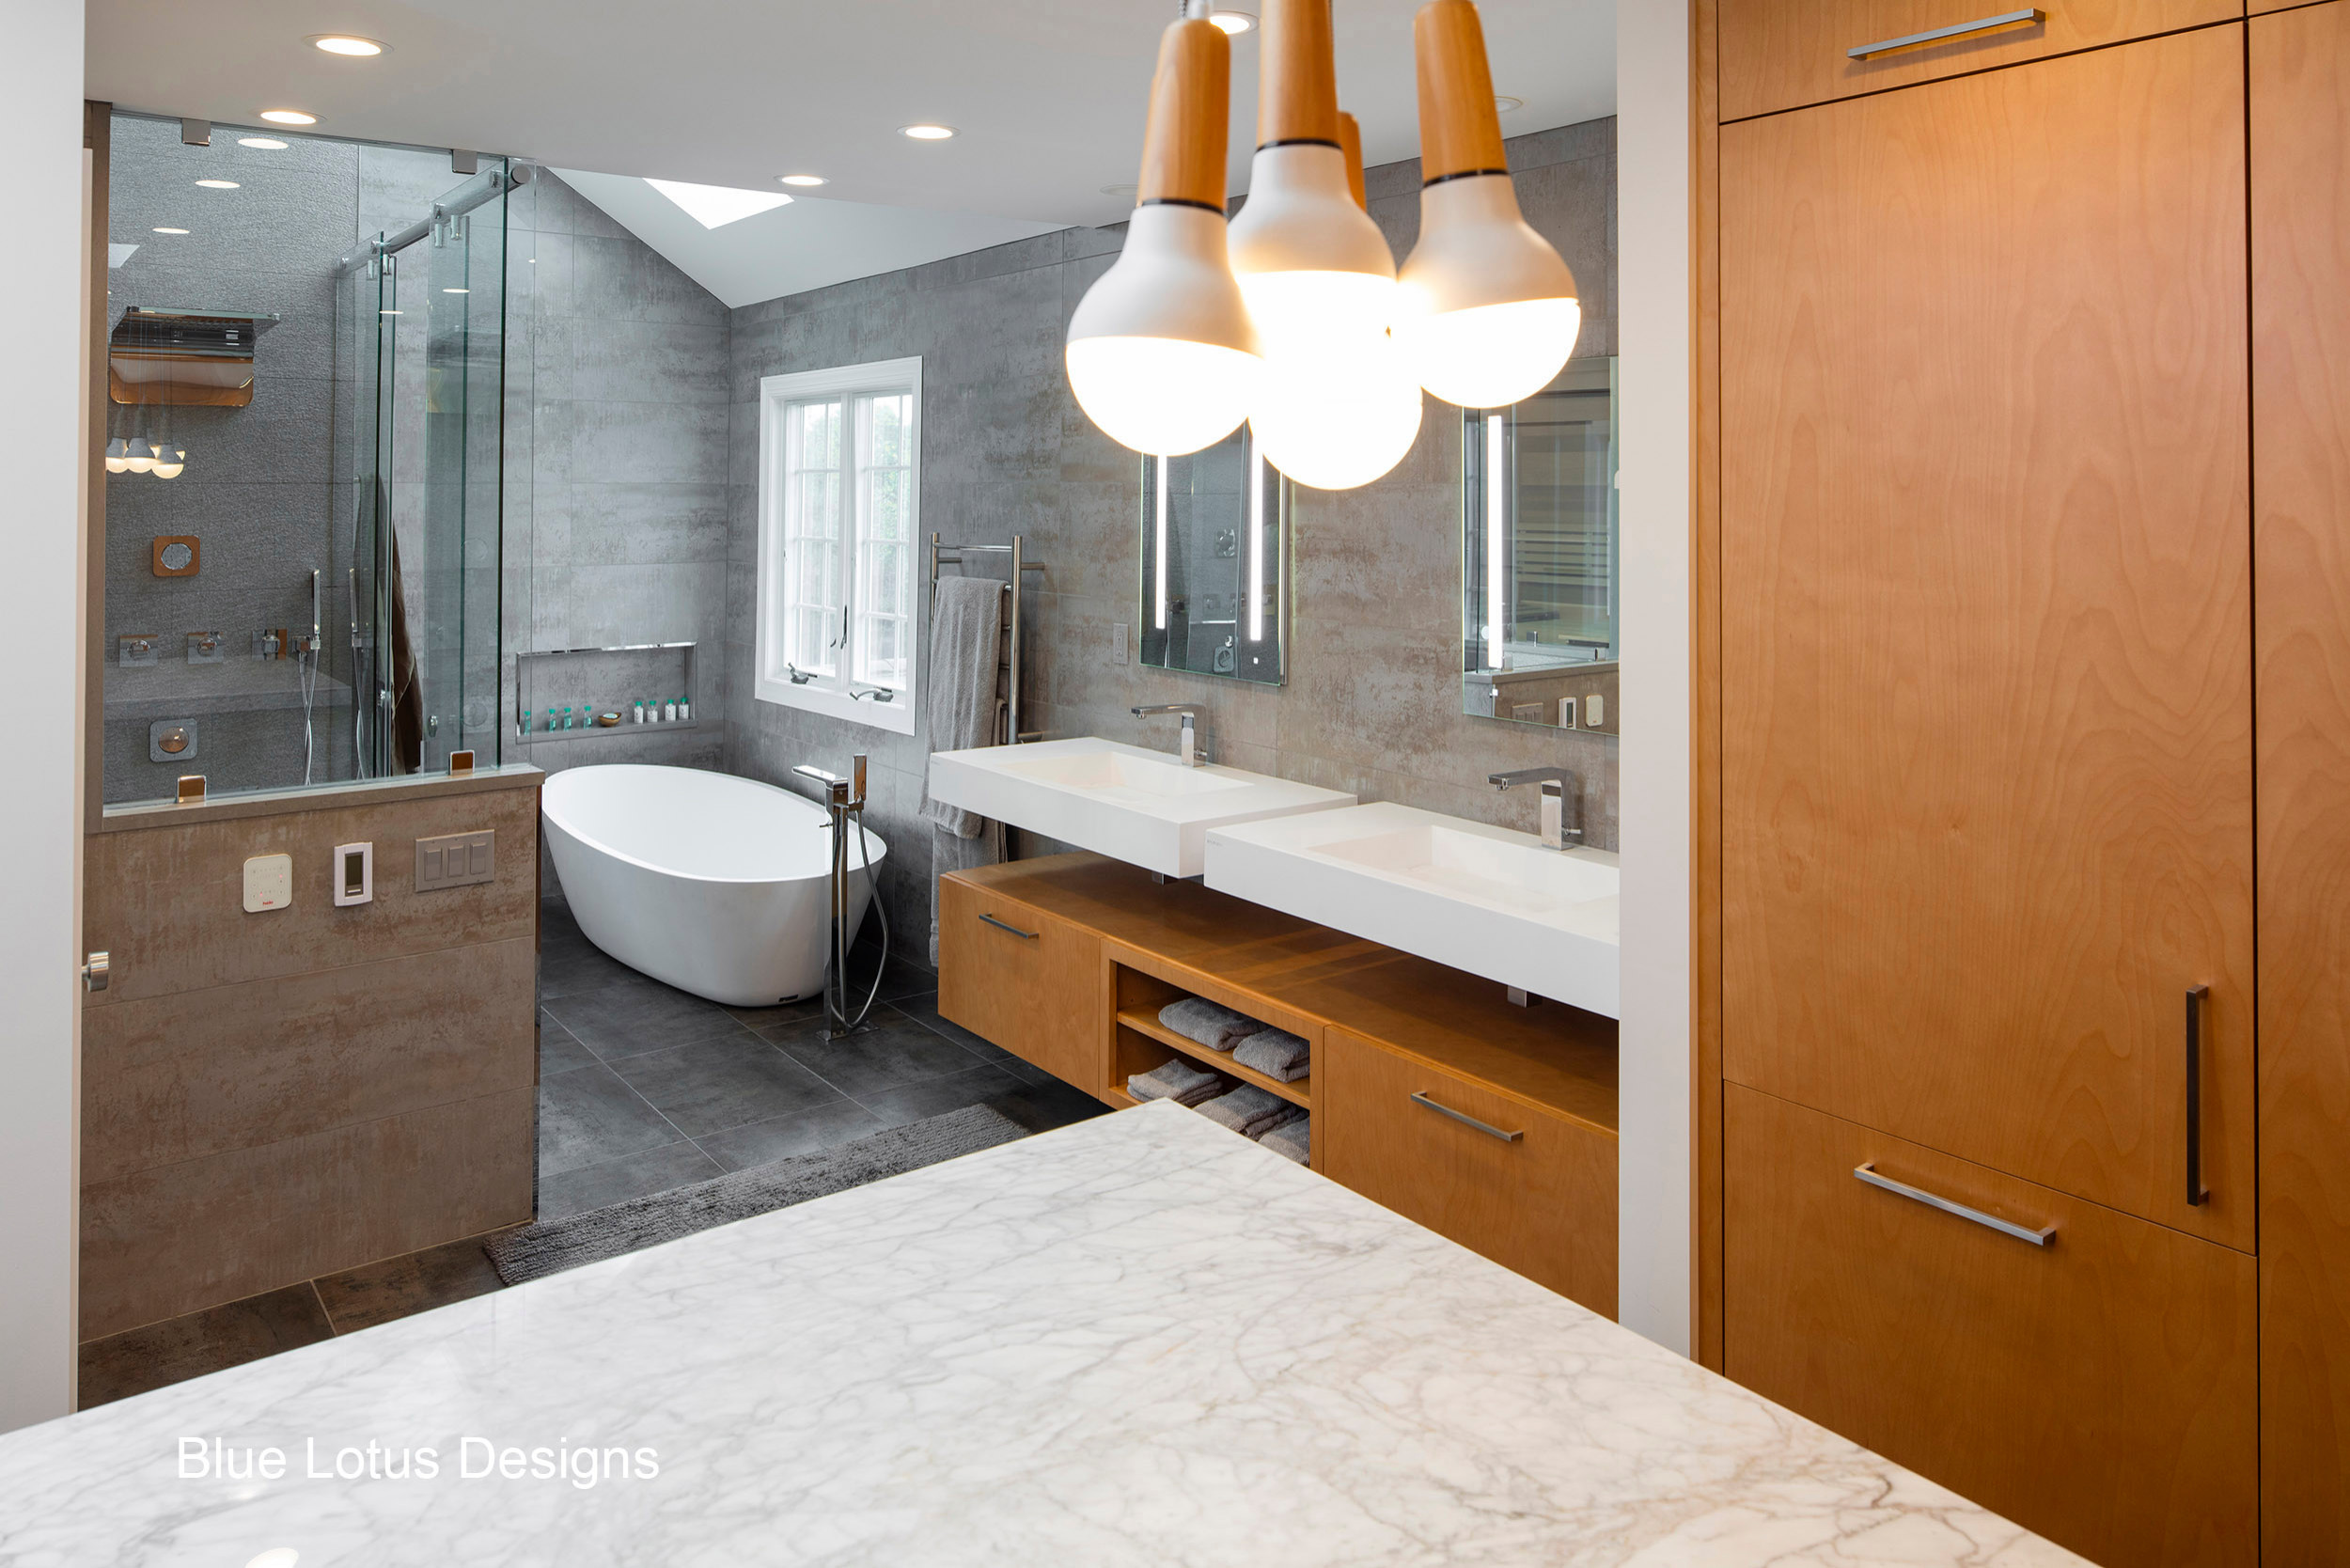 Smet Bathroom & Master Closet Renovation